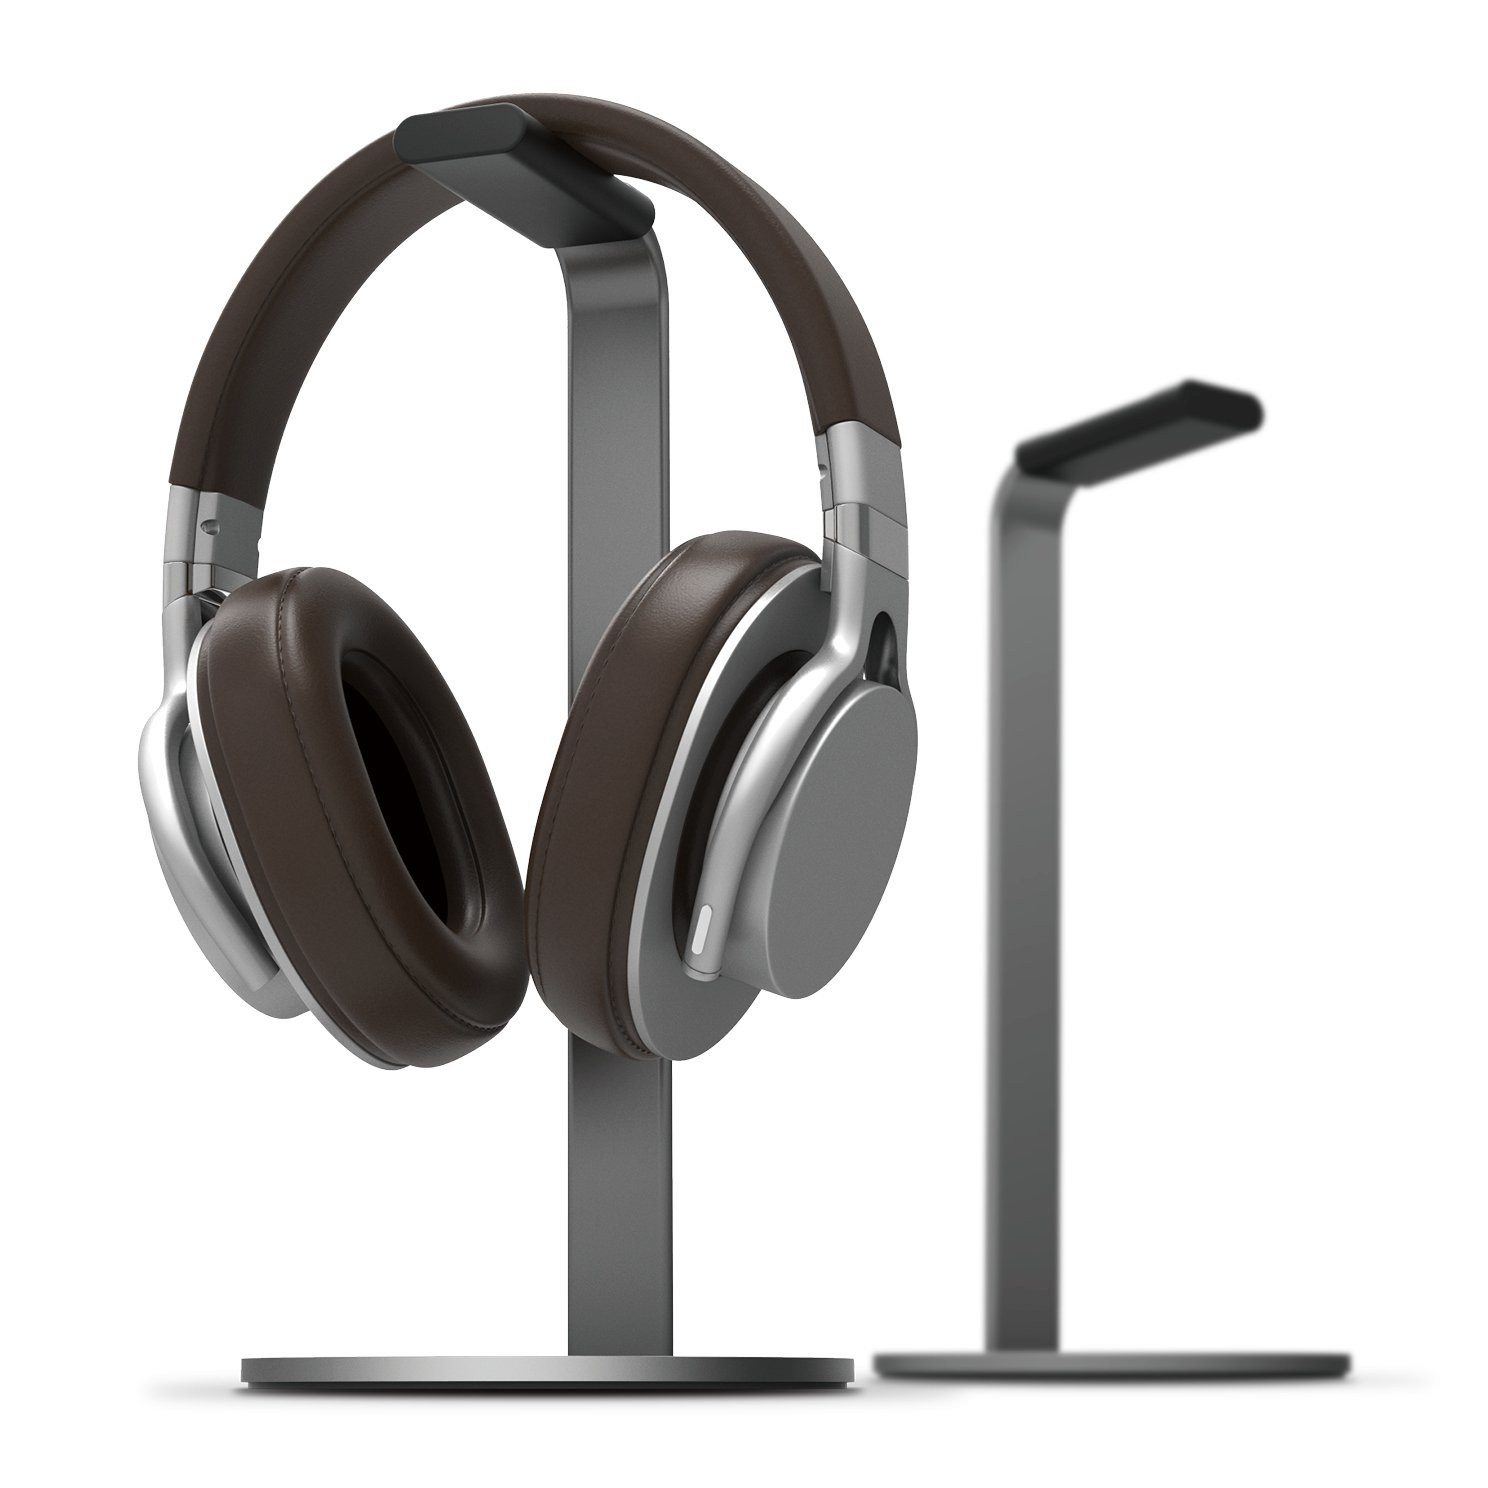 elago H Stand [Dark Gray] - [Premium Aluminum][Scratch-Free Padding][Perfect Height] Gaming and Audio Headphones by elago